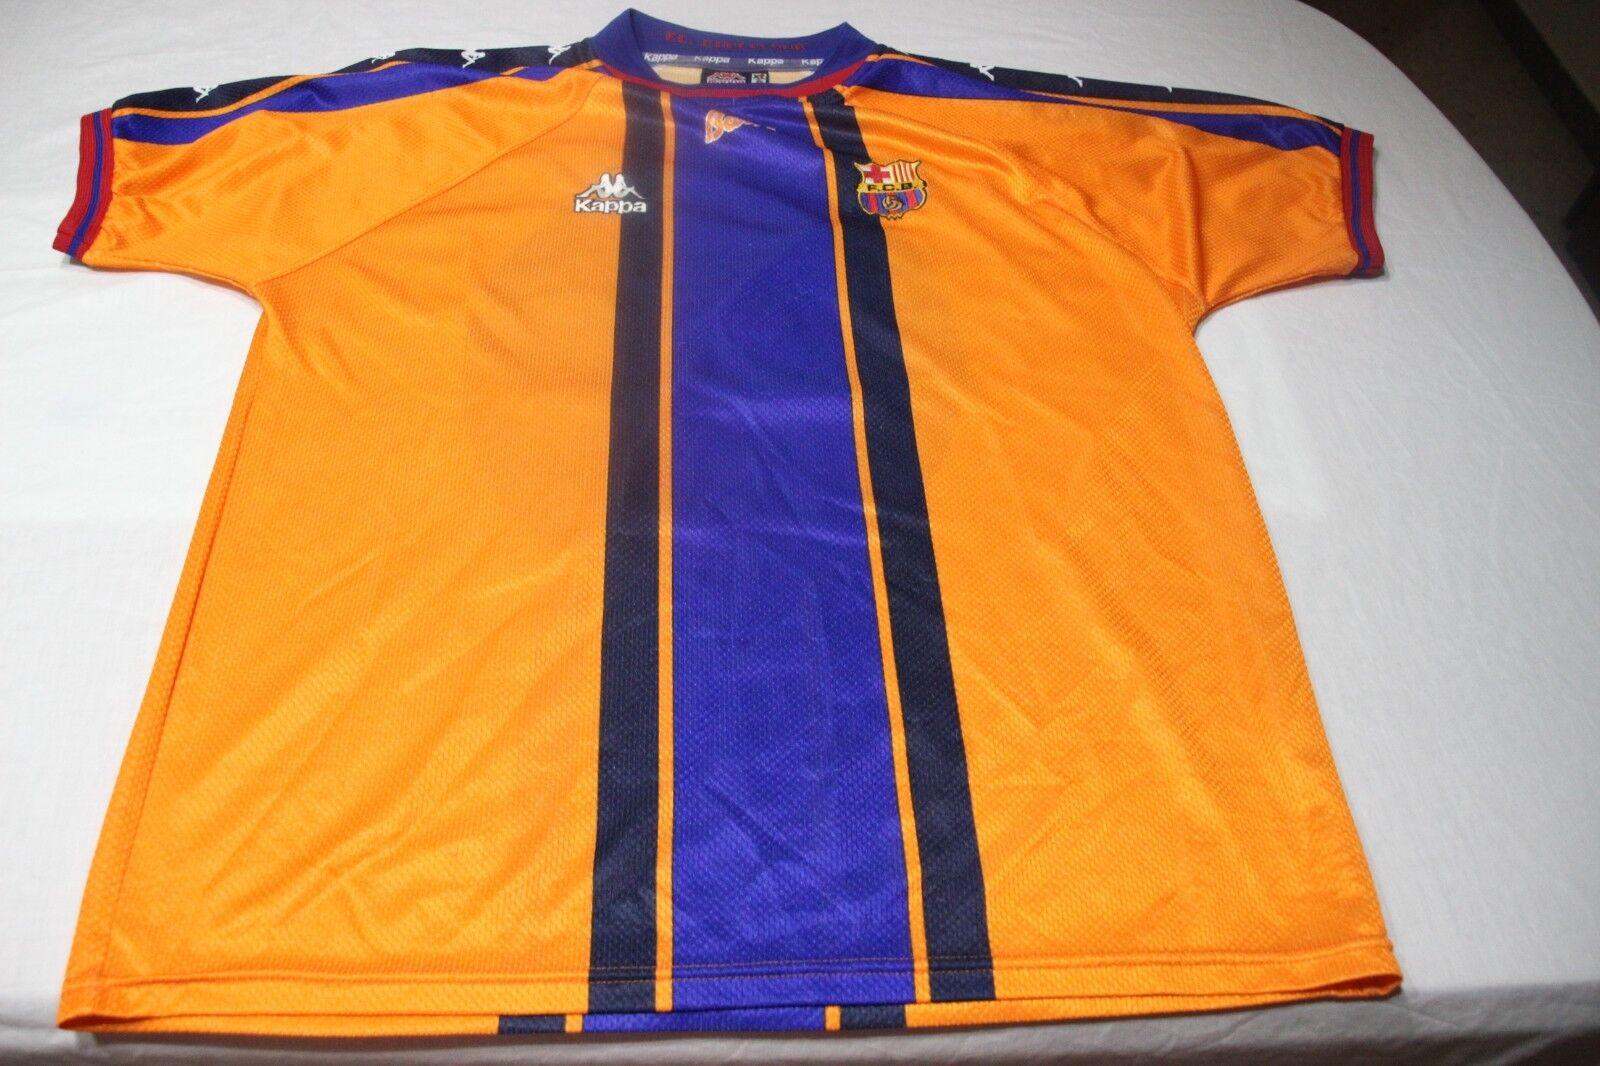 CAMISETA OFICIAL VINTAGE FC BARCELONA MARCA KAPPA TALLA XL Nº 23 DE LA PEÑA SHIR